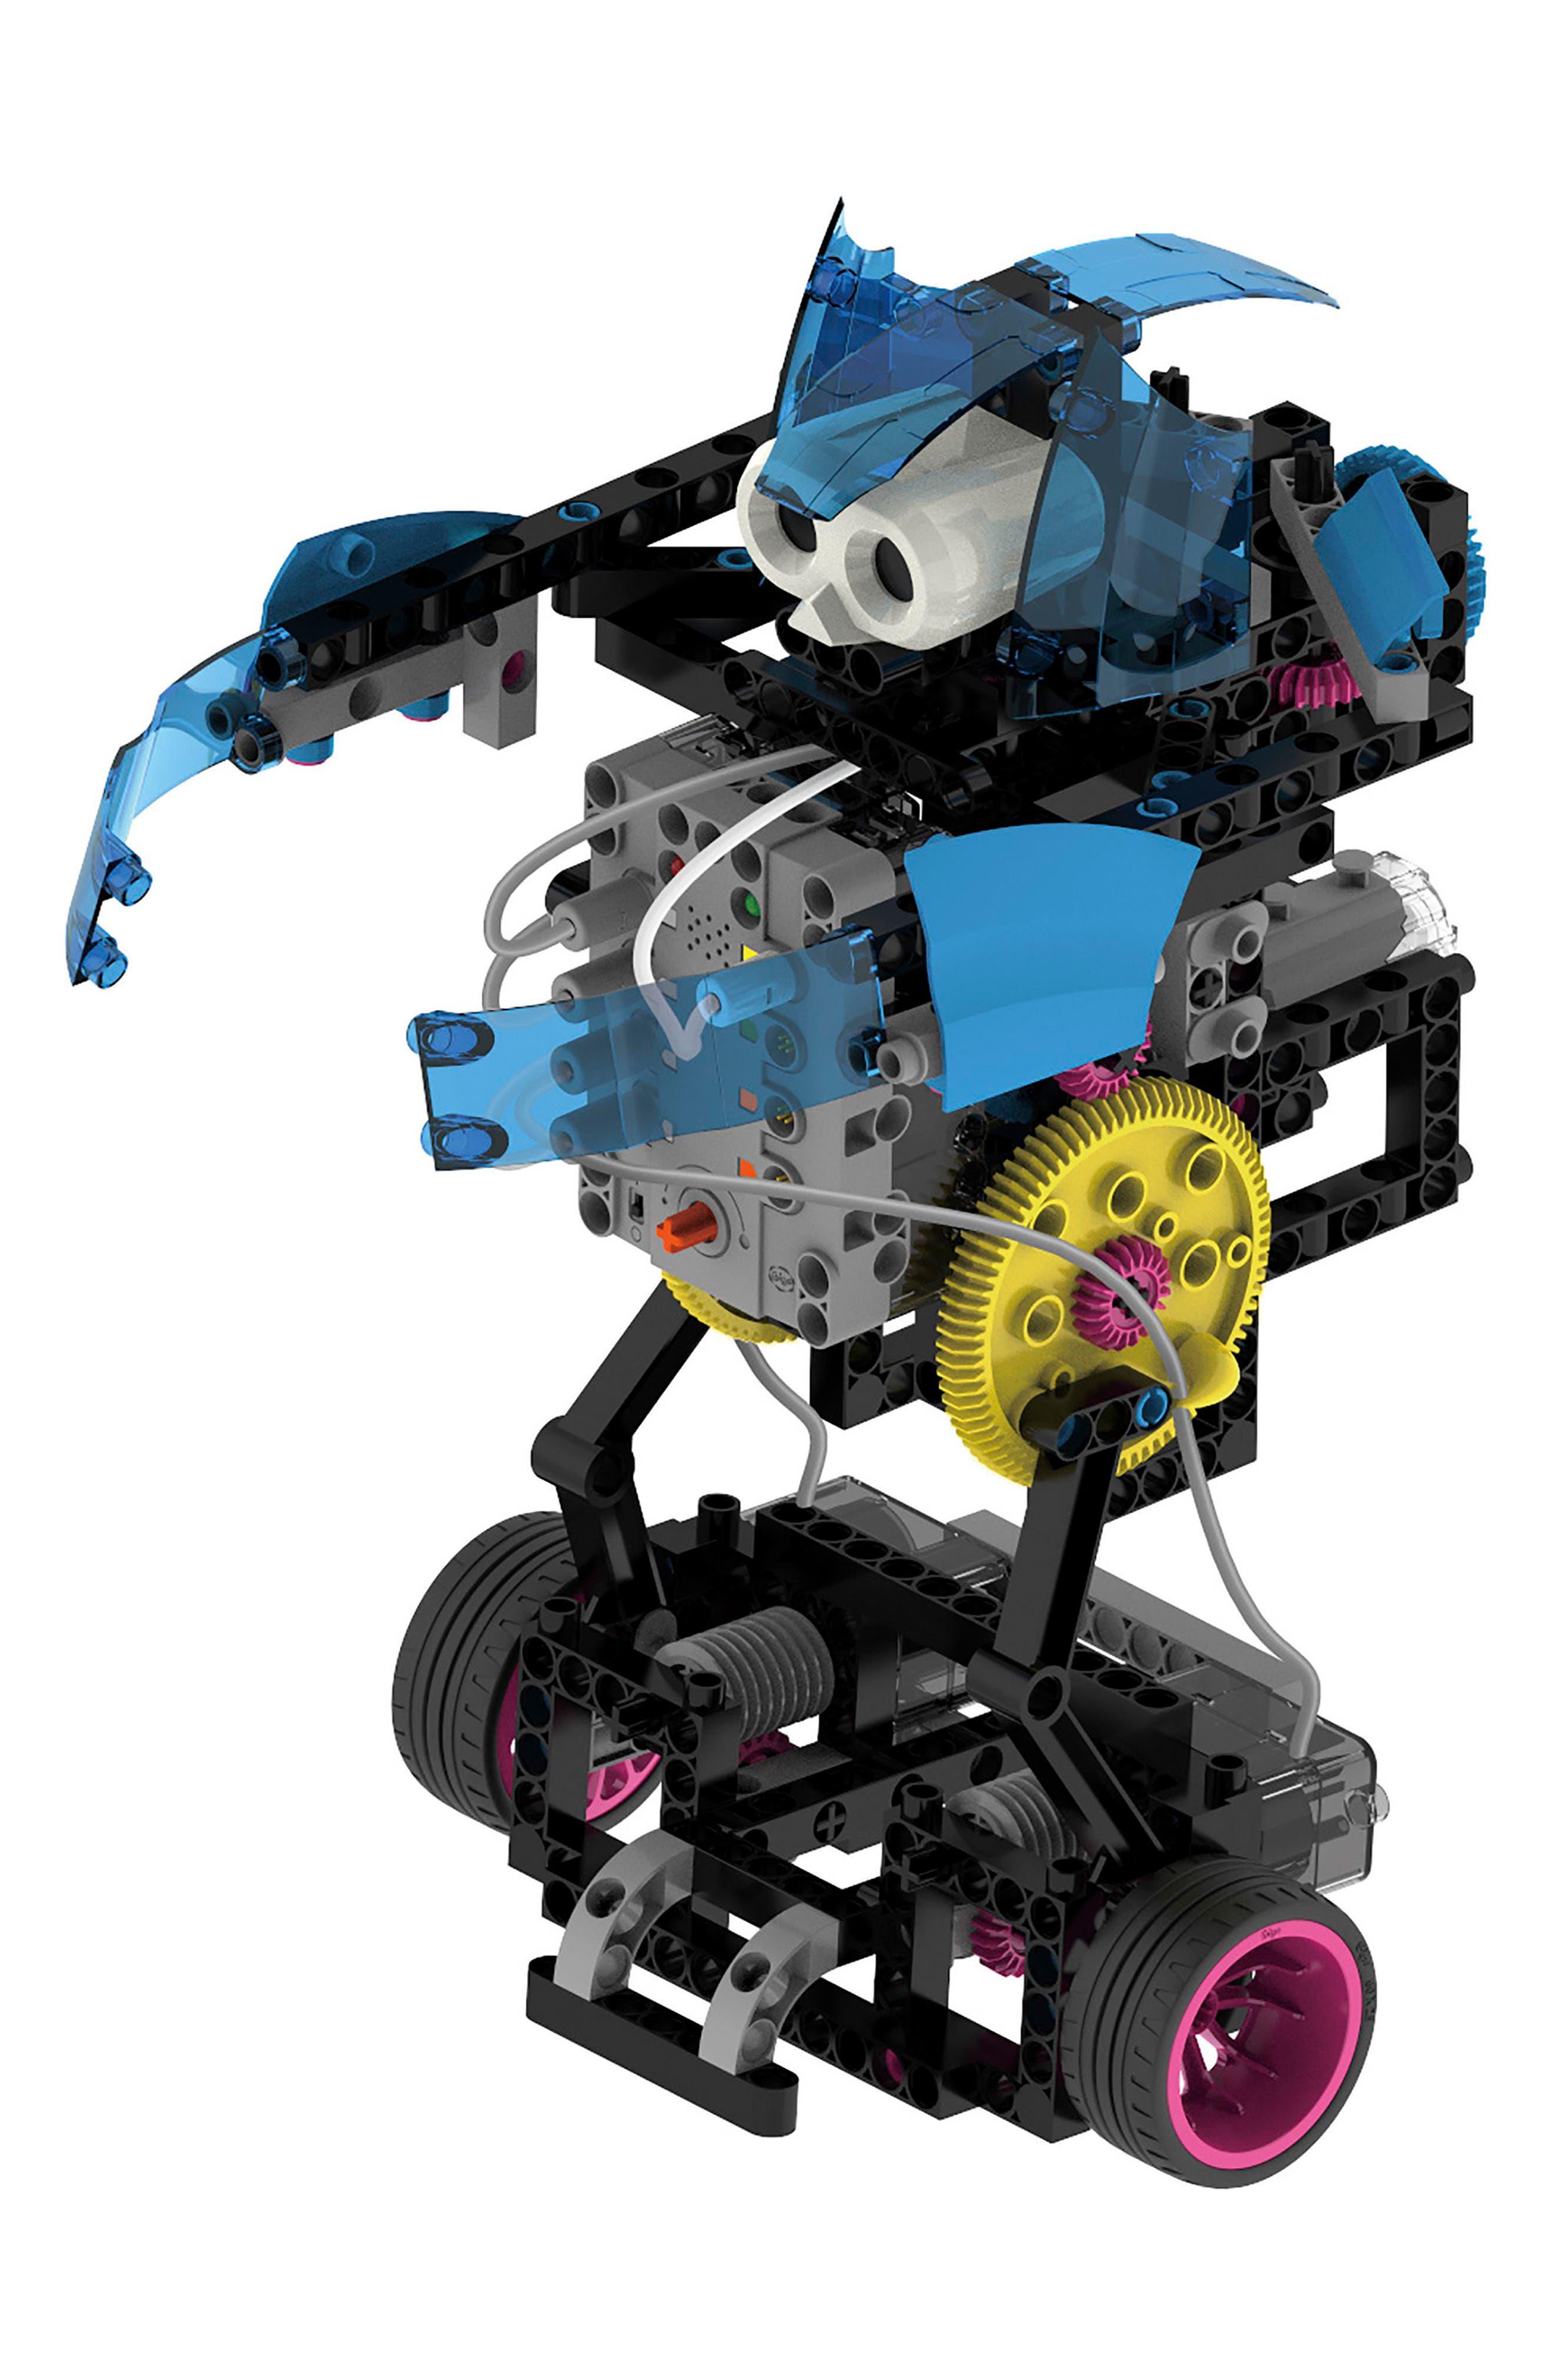 Robotics Building Kit,                             Main thumbnail 1, color,                             No Color